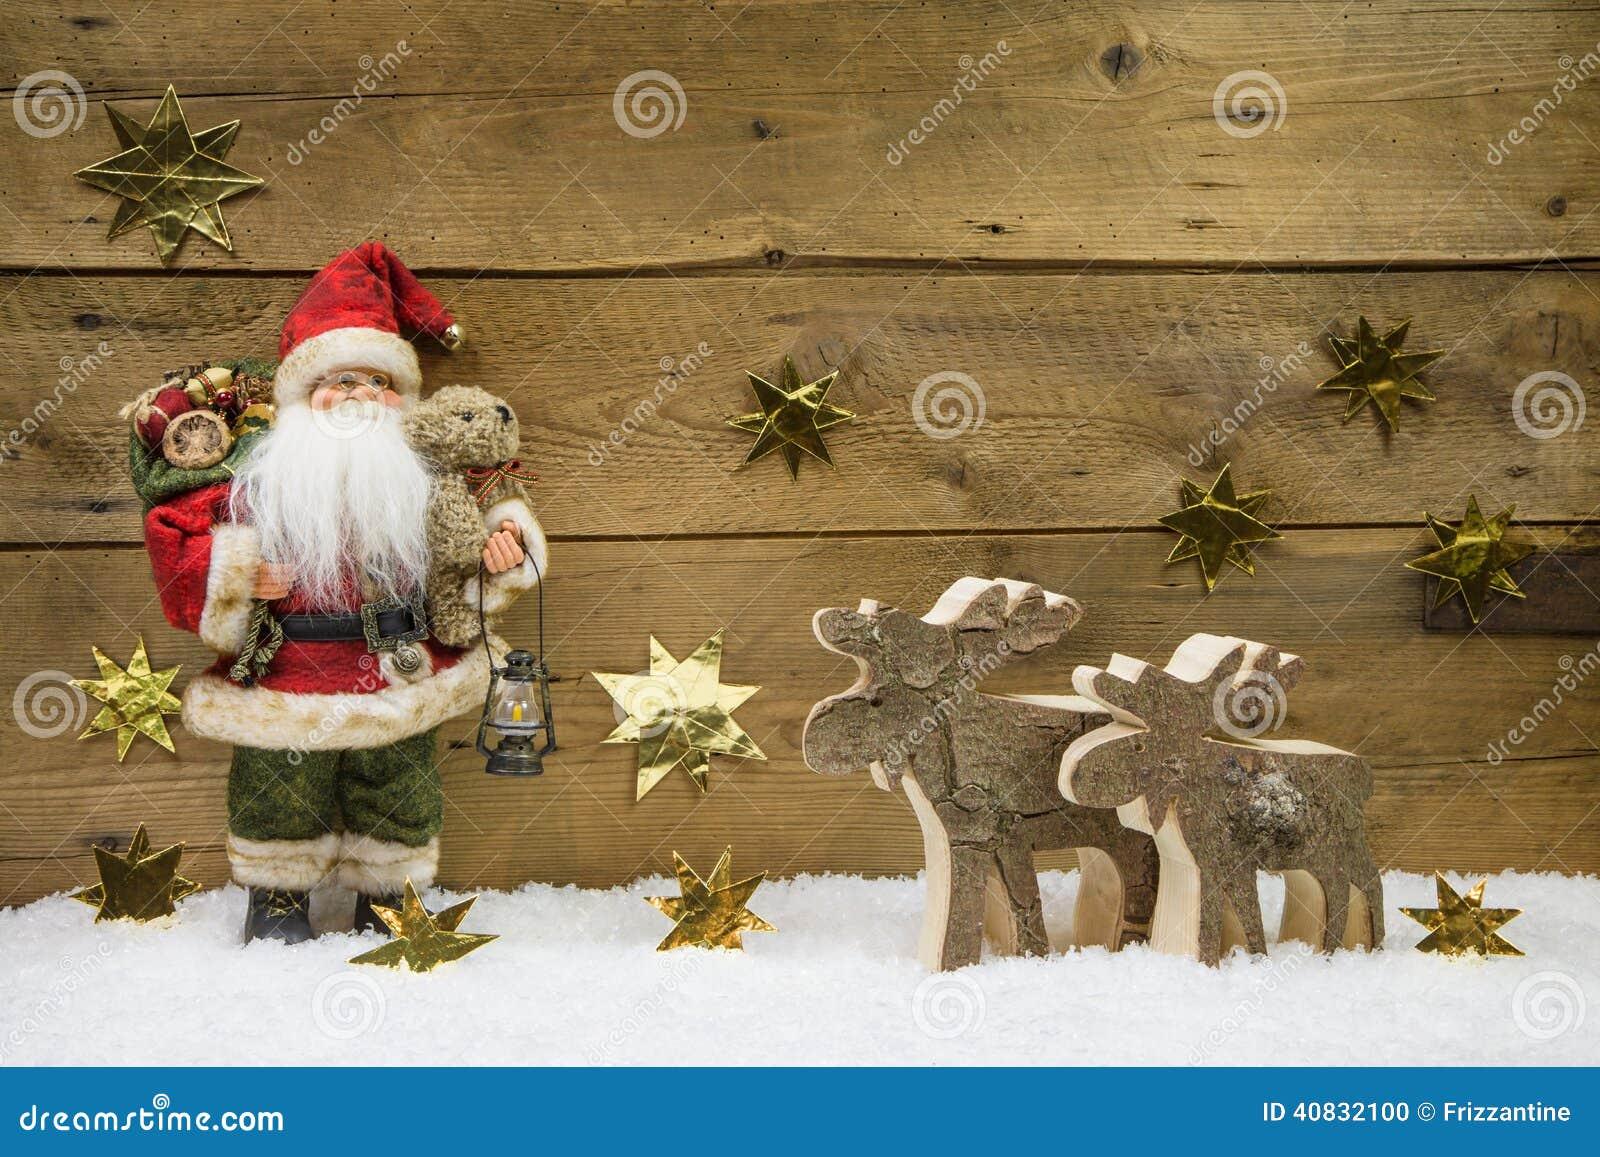 Christmas Decorations Wood Wallpaper